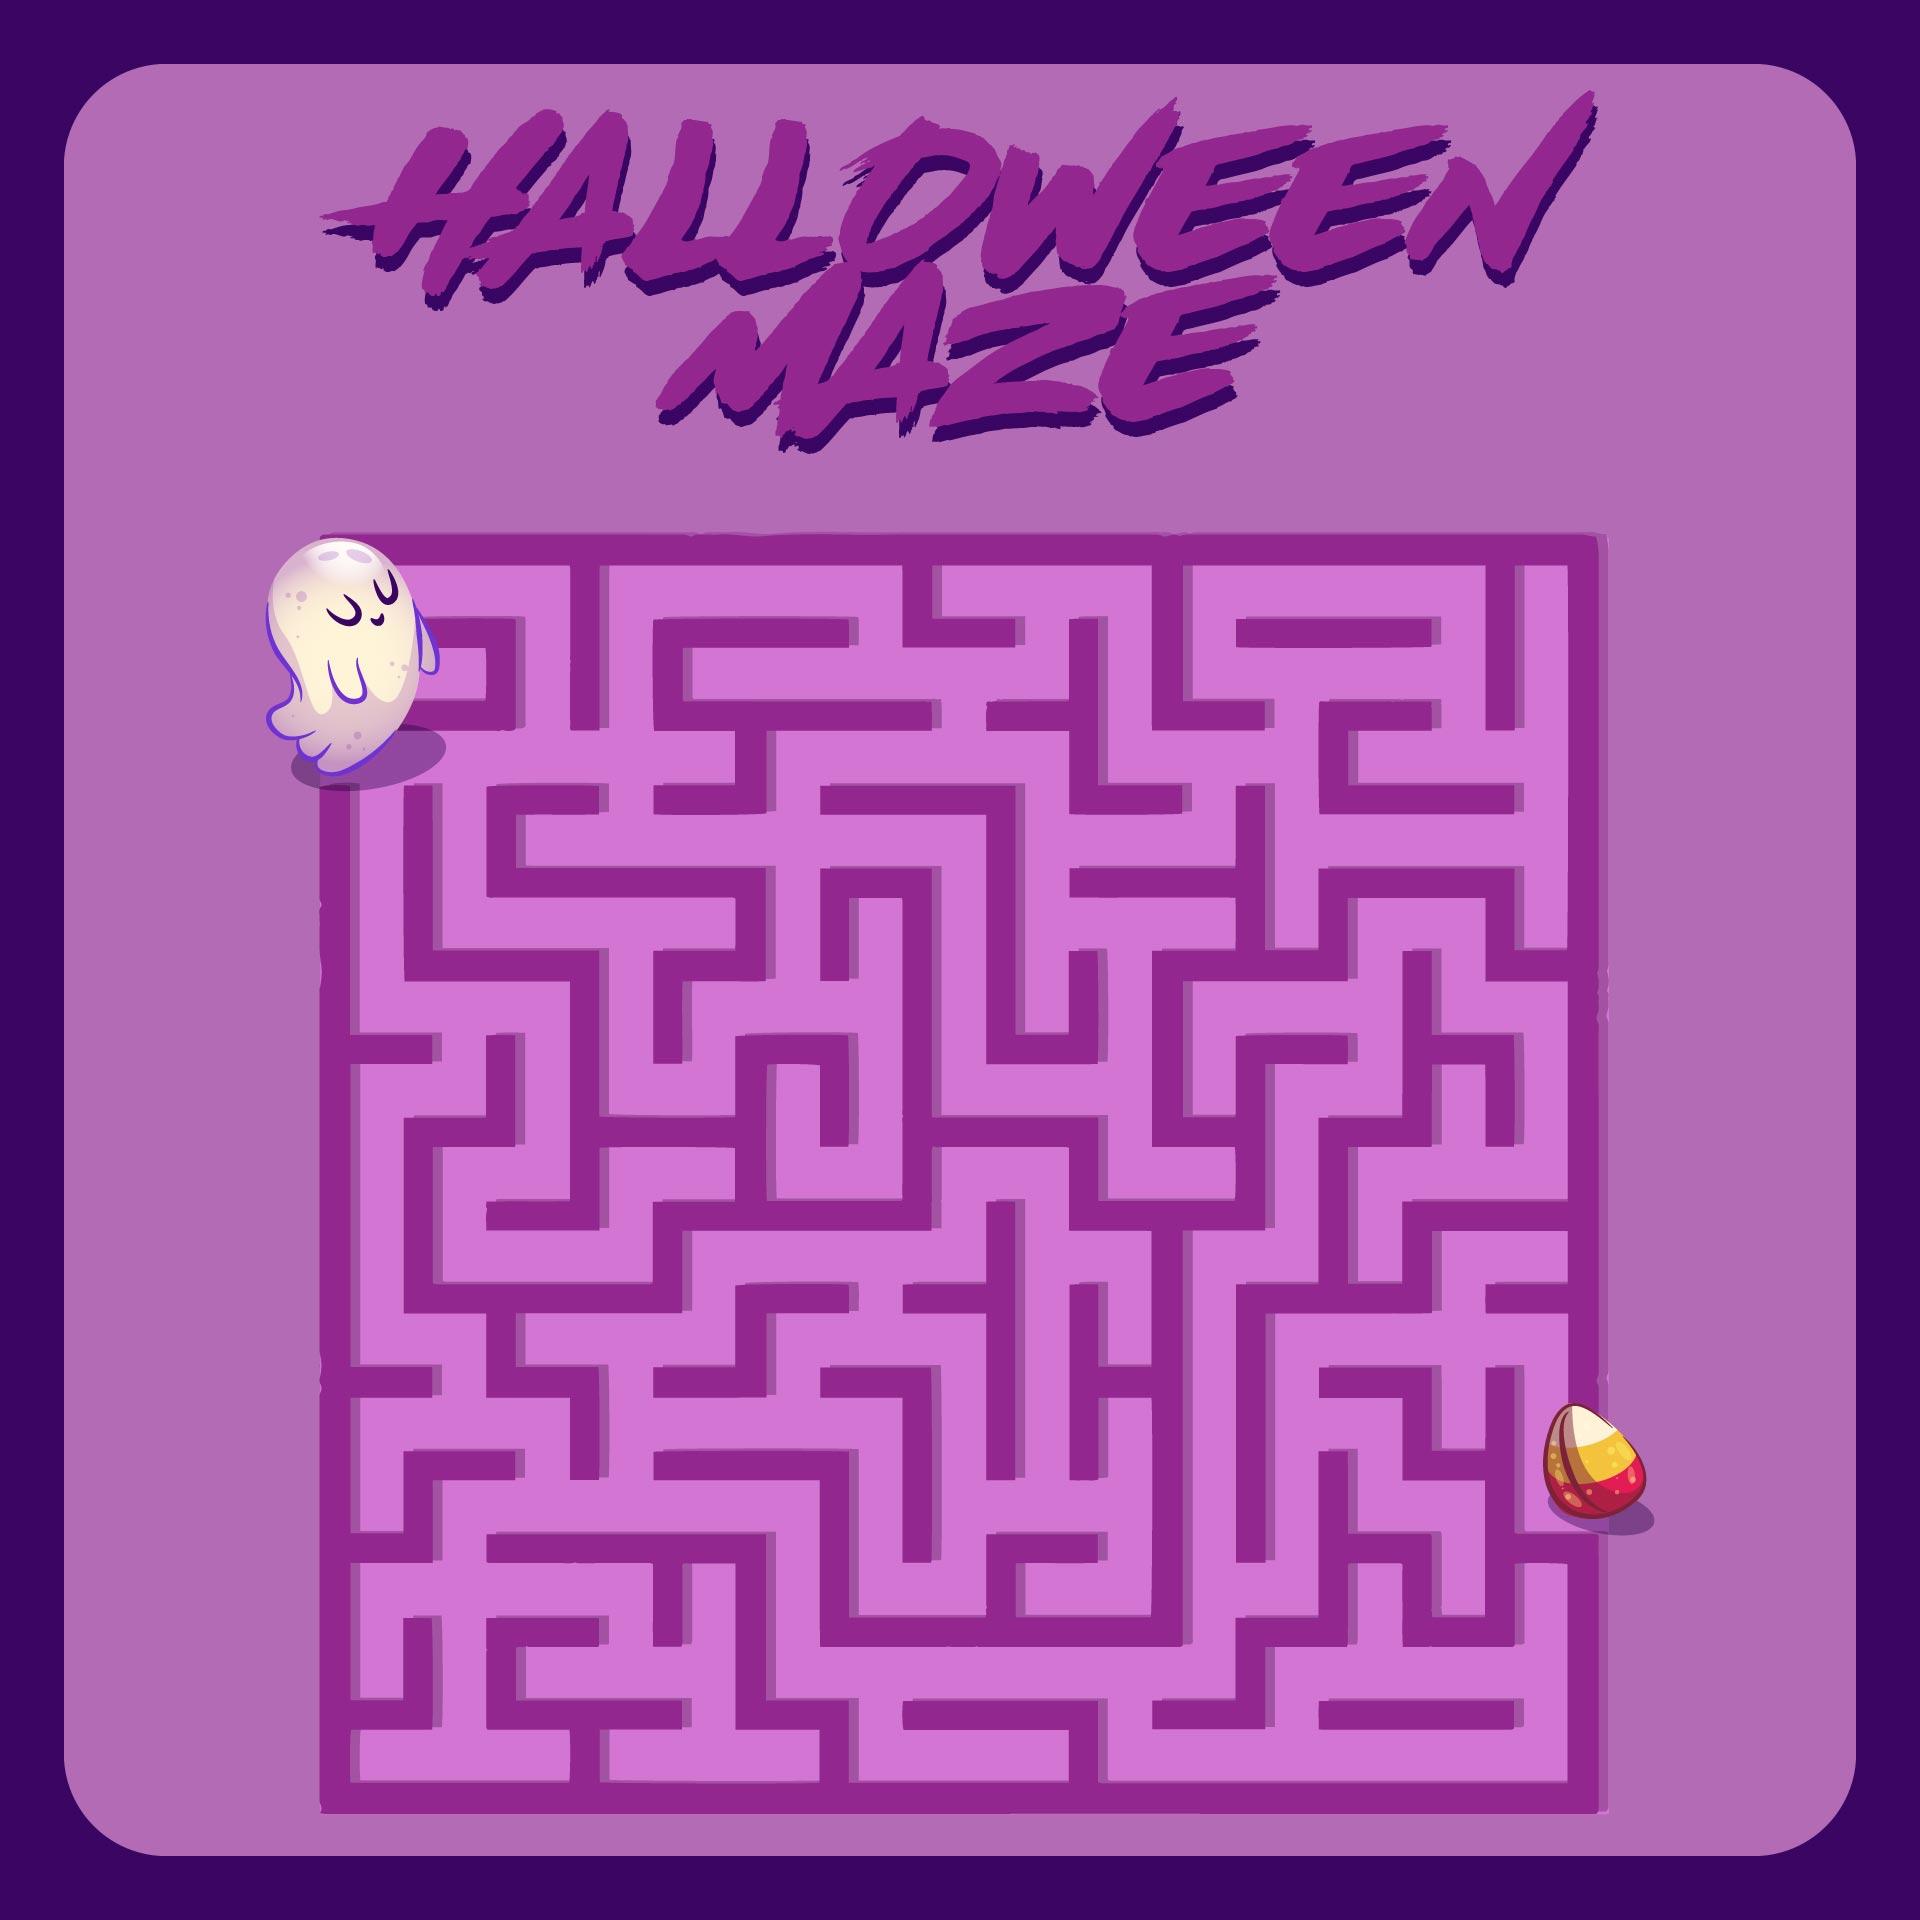 Hard Halloween Mazes Printable